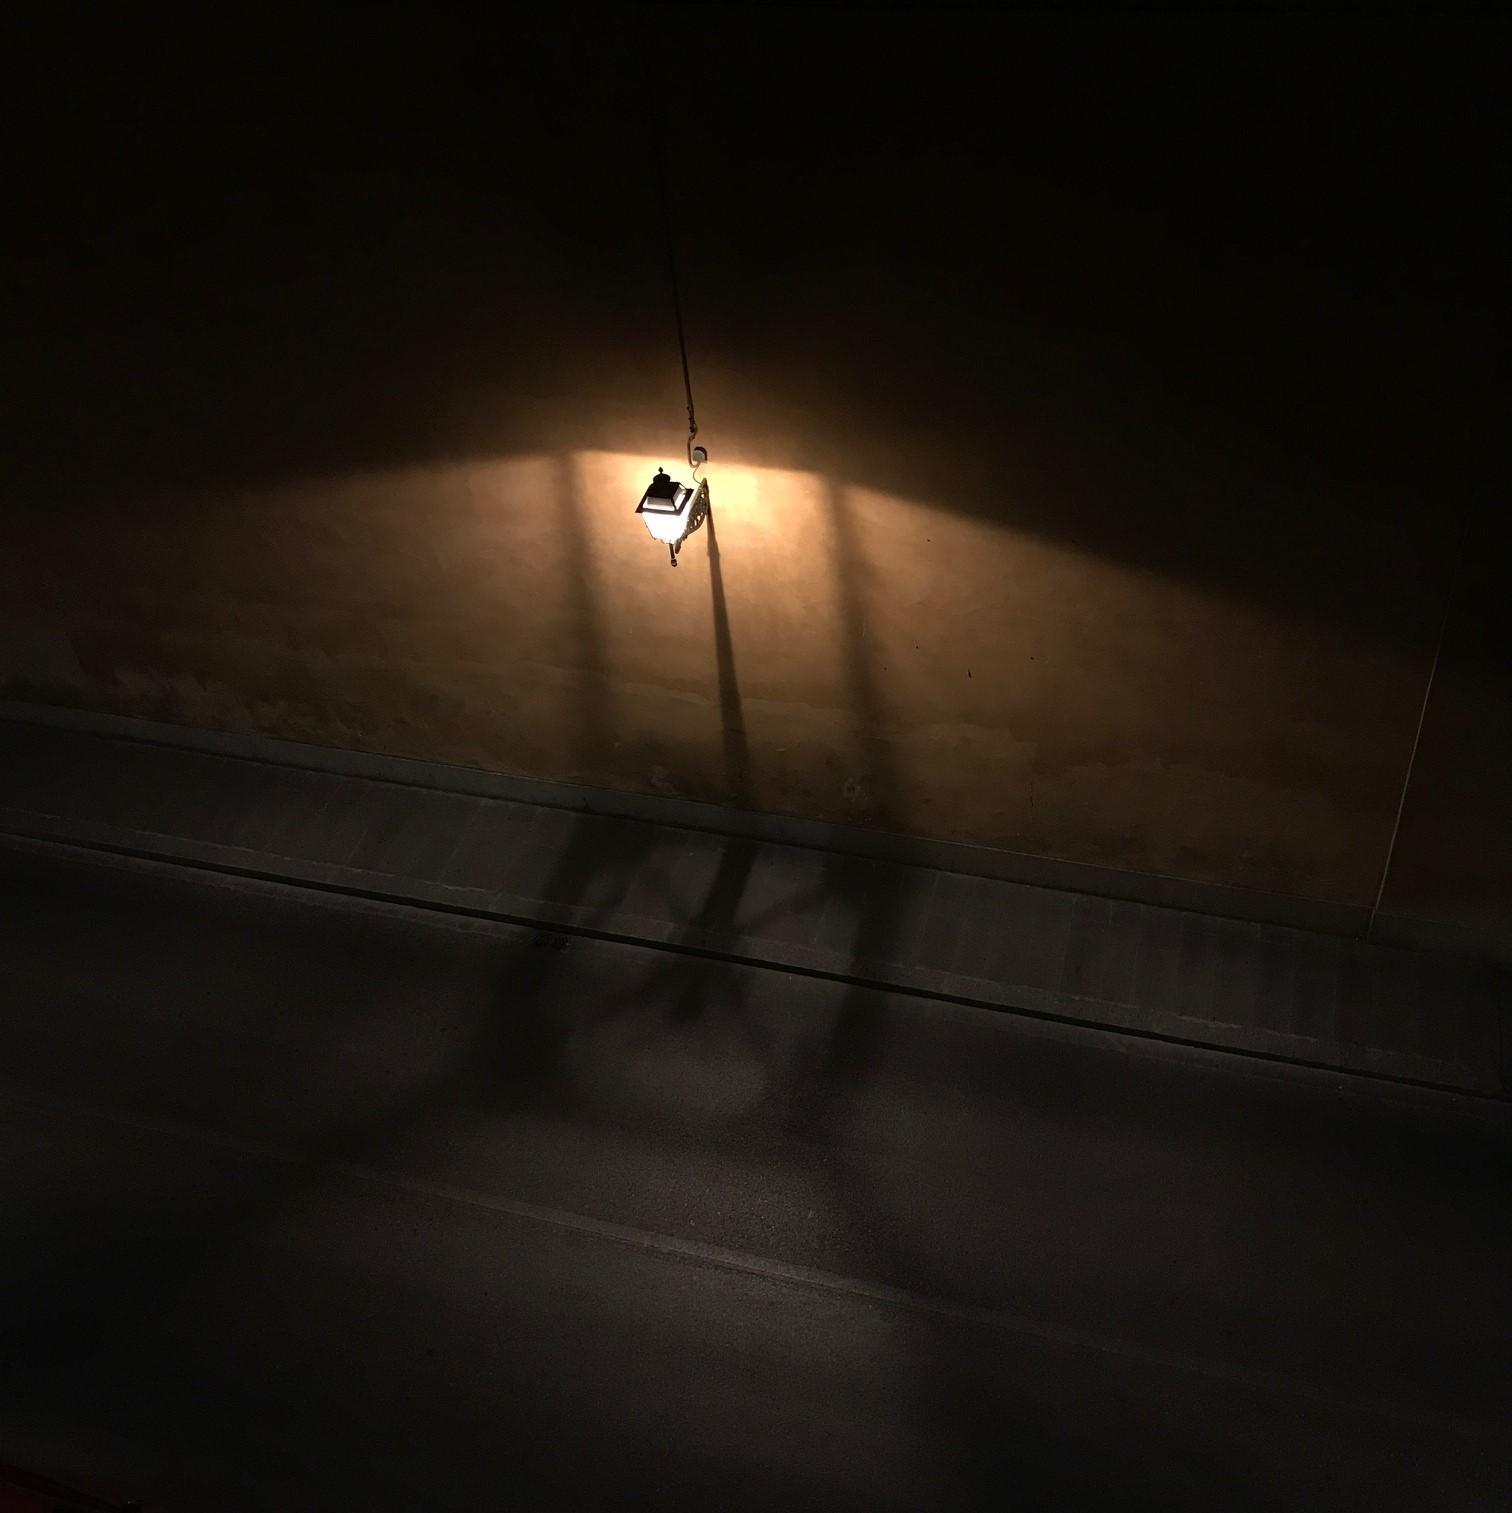 street light 1 (2).JPG